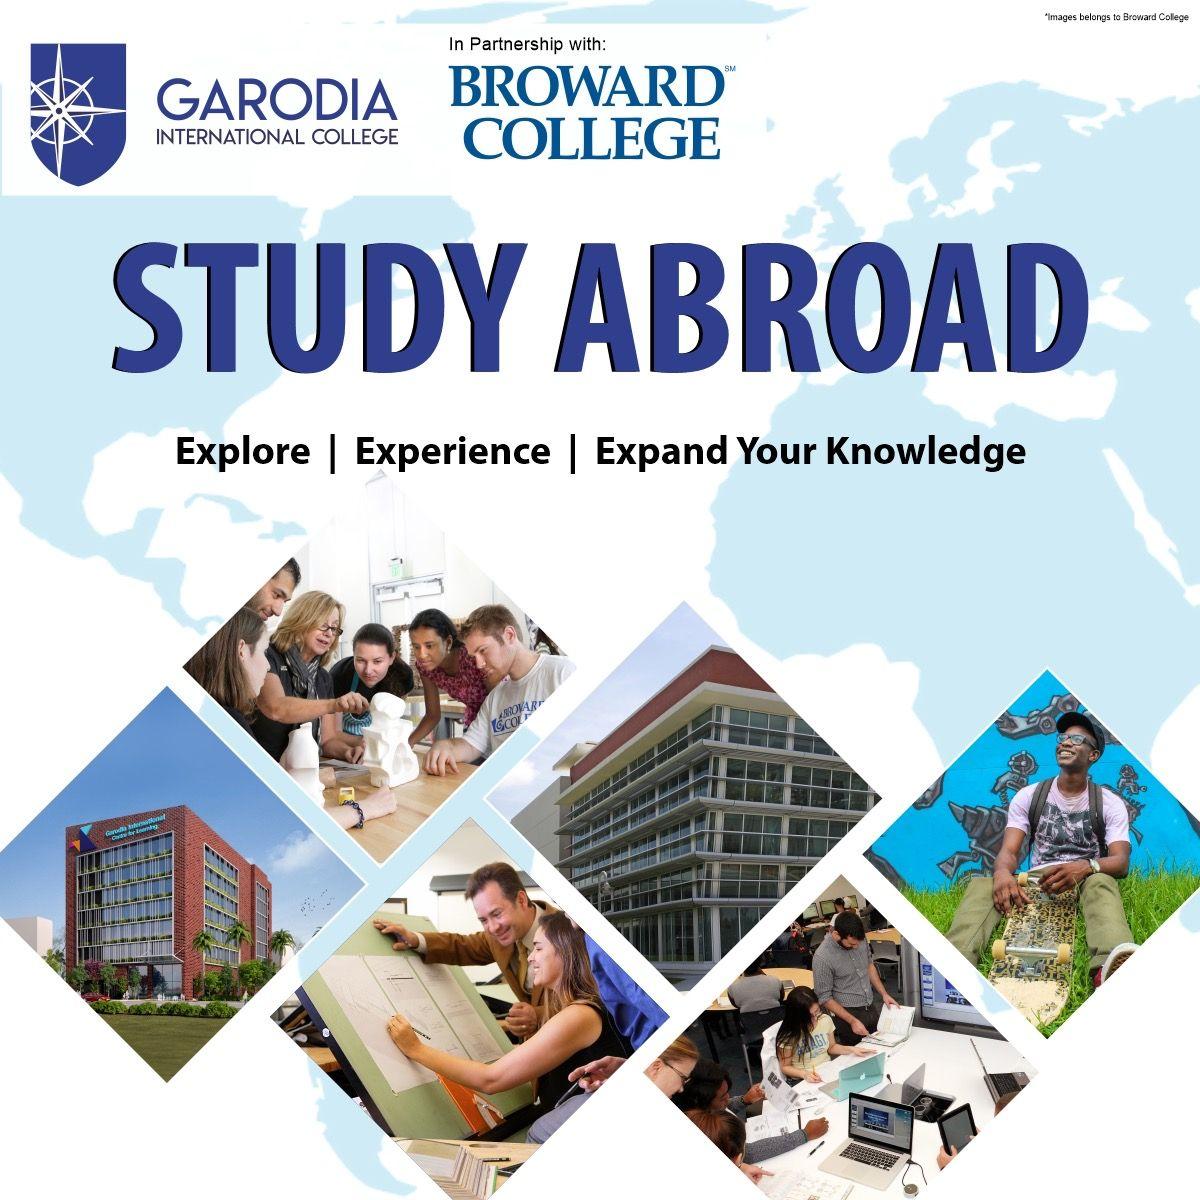 Broward College Academic Calendar 2022.Study Abroad Education In India Education College Broward College